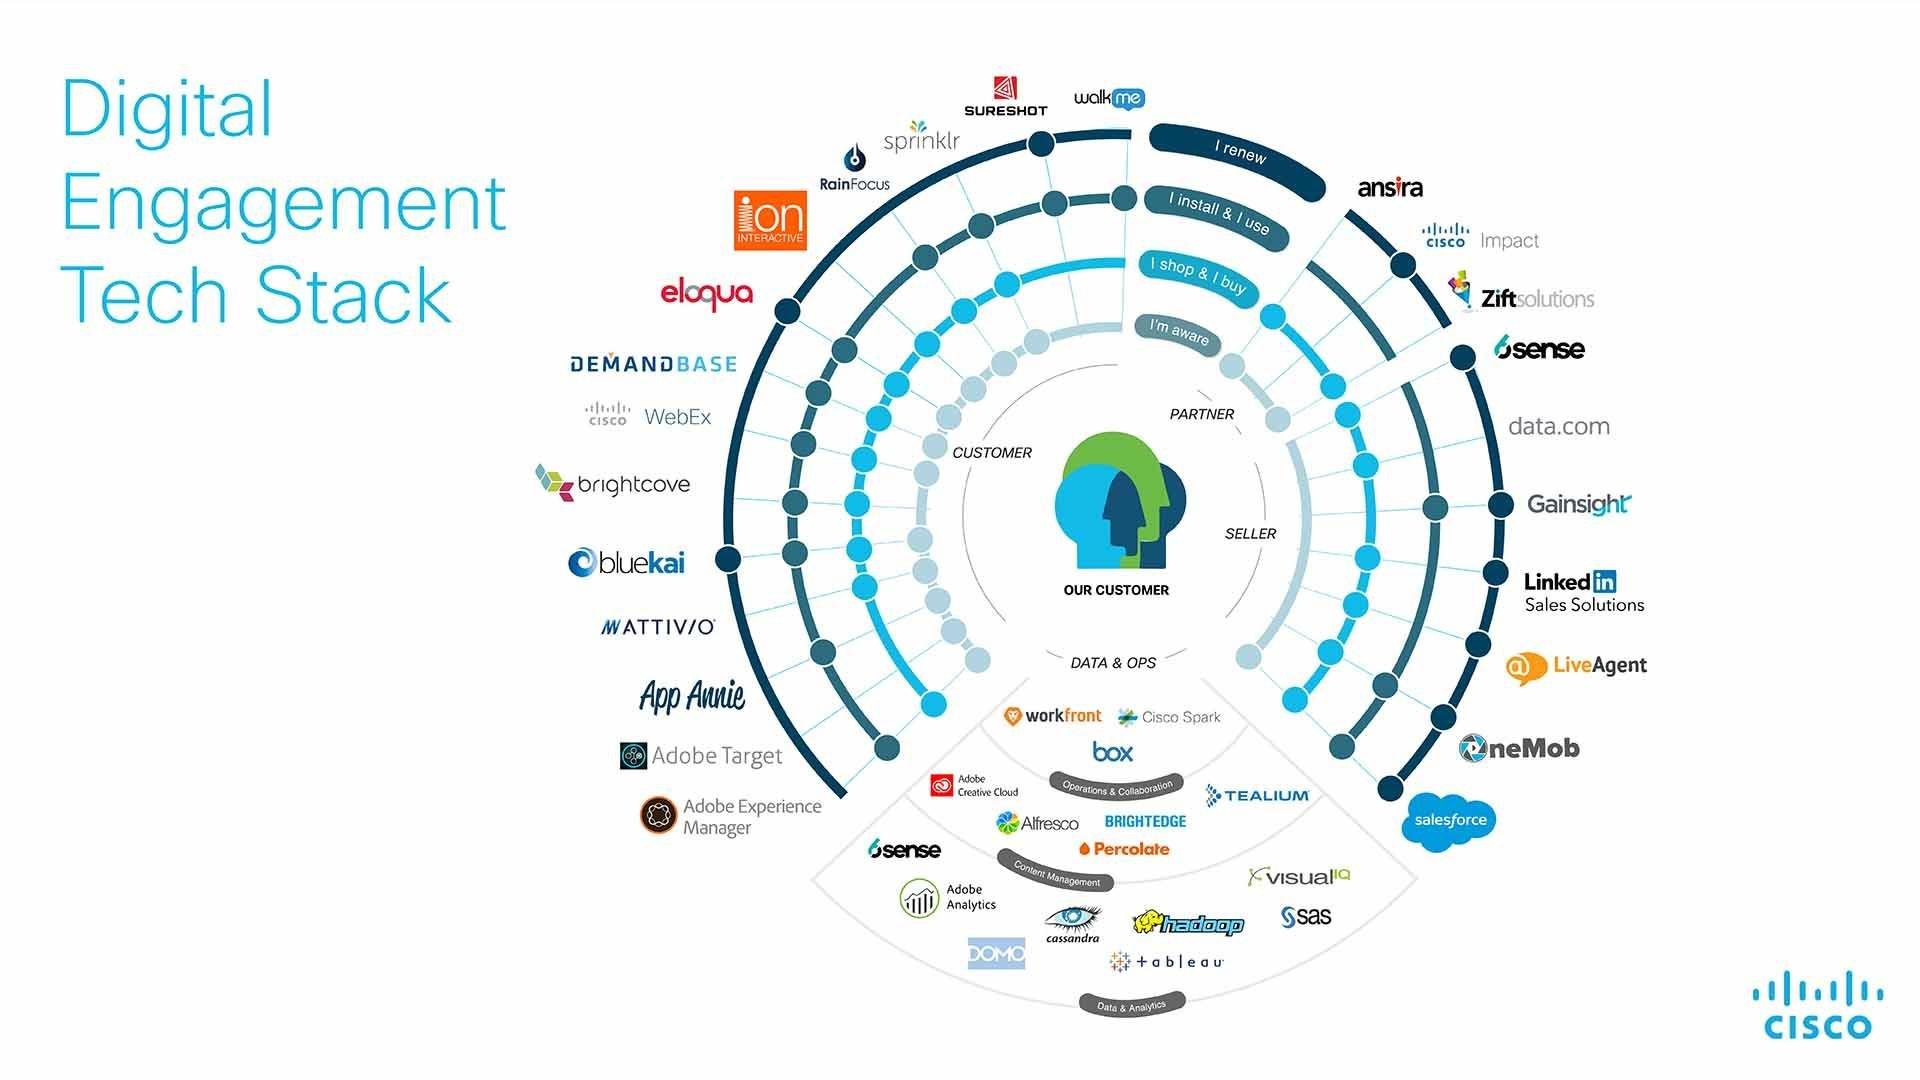 Digital Engagement Tech Stack